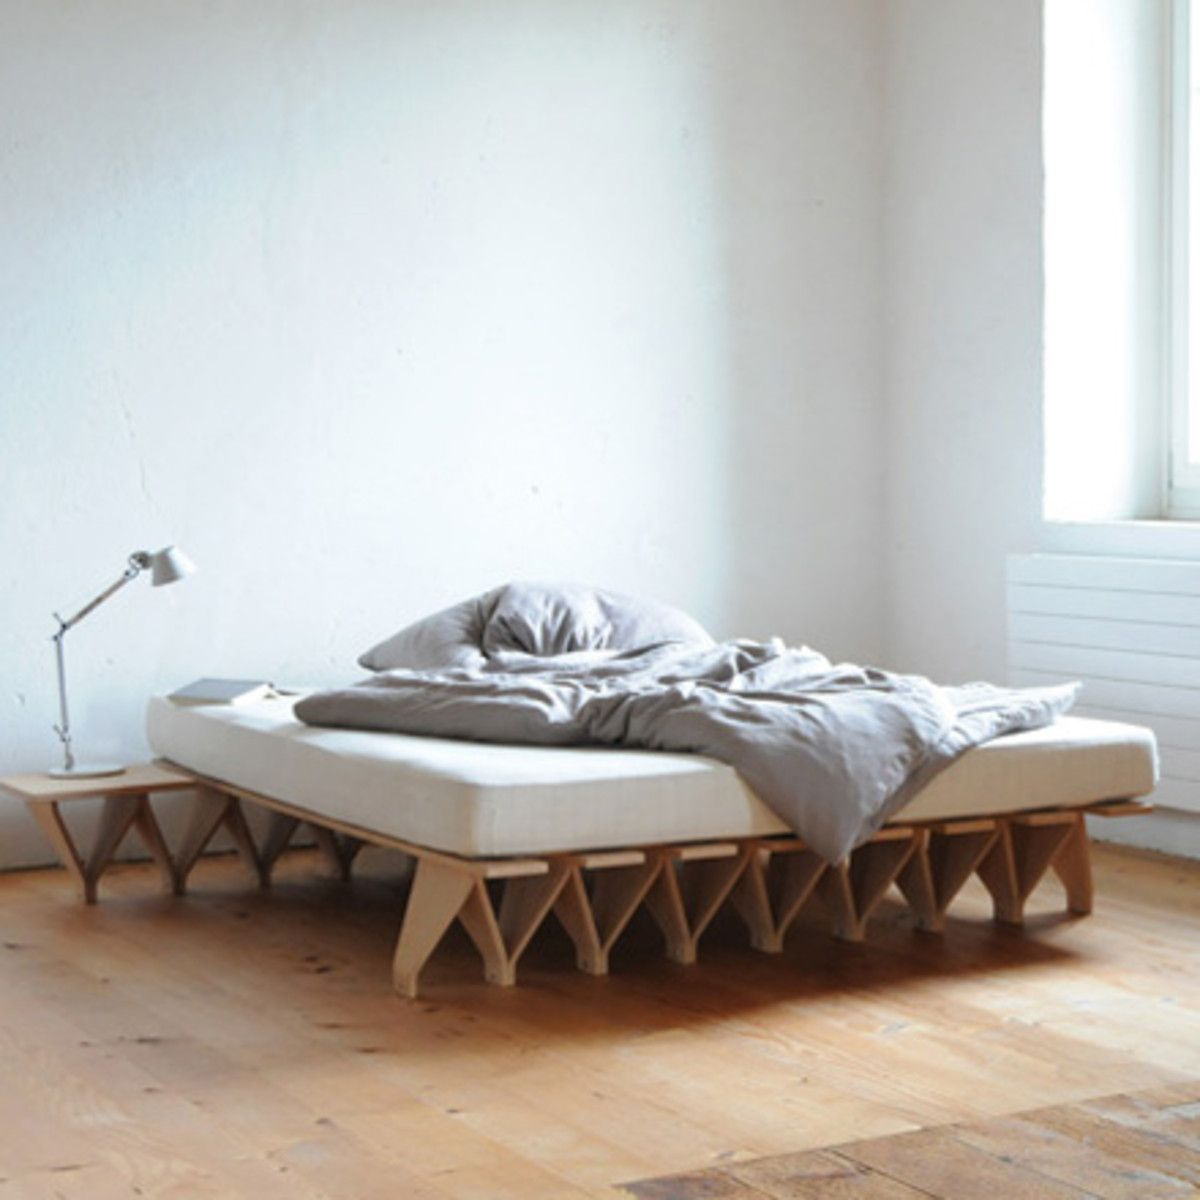 lieg modulares bettsystem tojo shop tojo bett designerbetten und g stebett. Black Bedroom Furniture Sets. Home Design Ideas